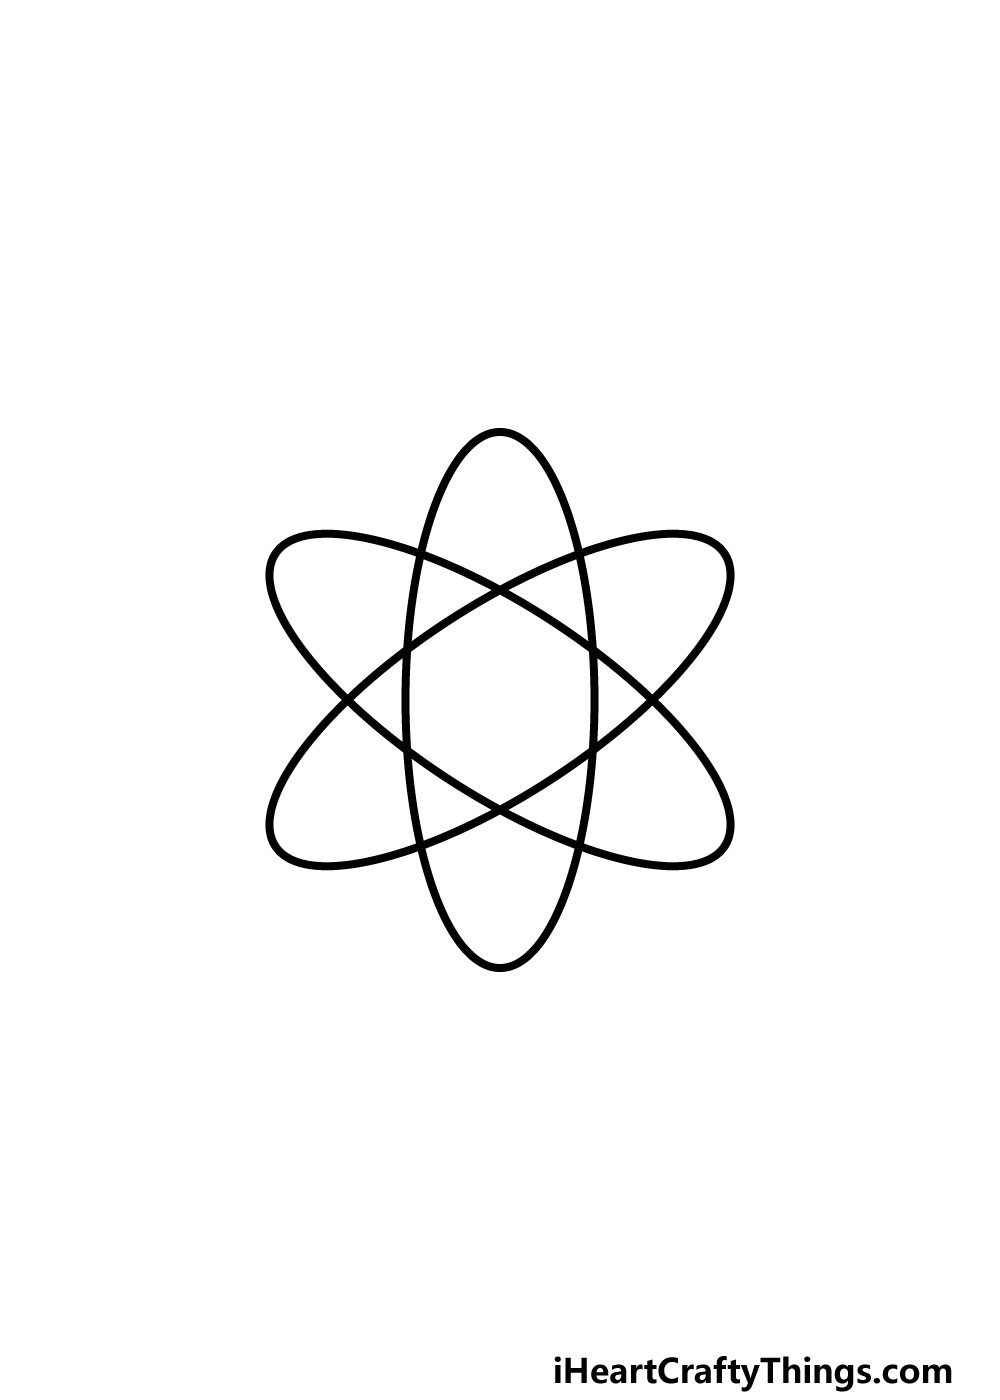 drawing an atom step 3